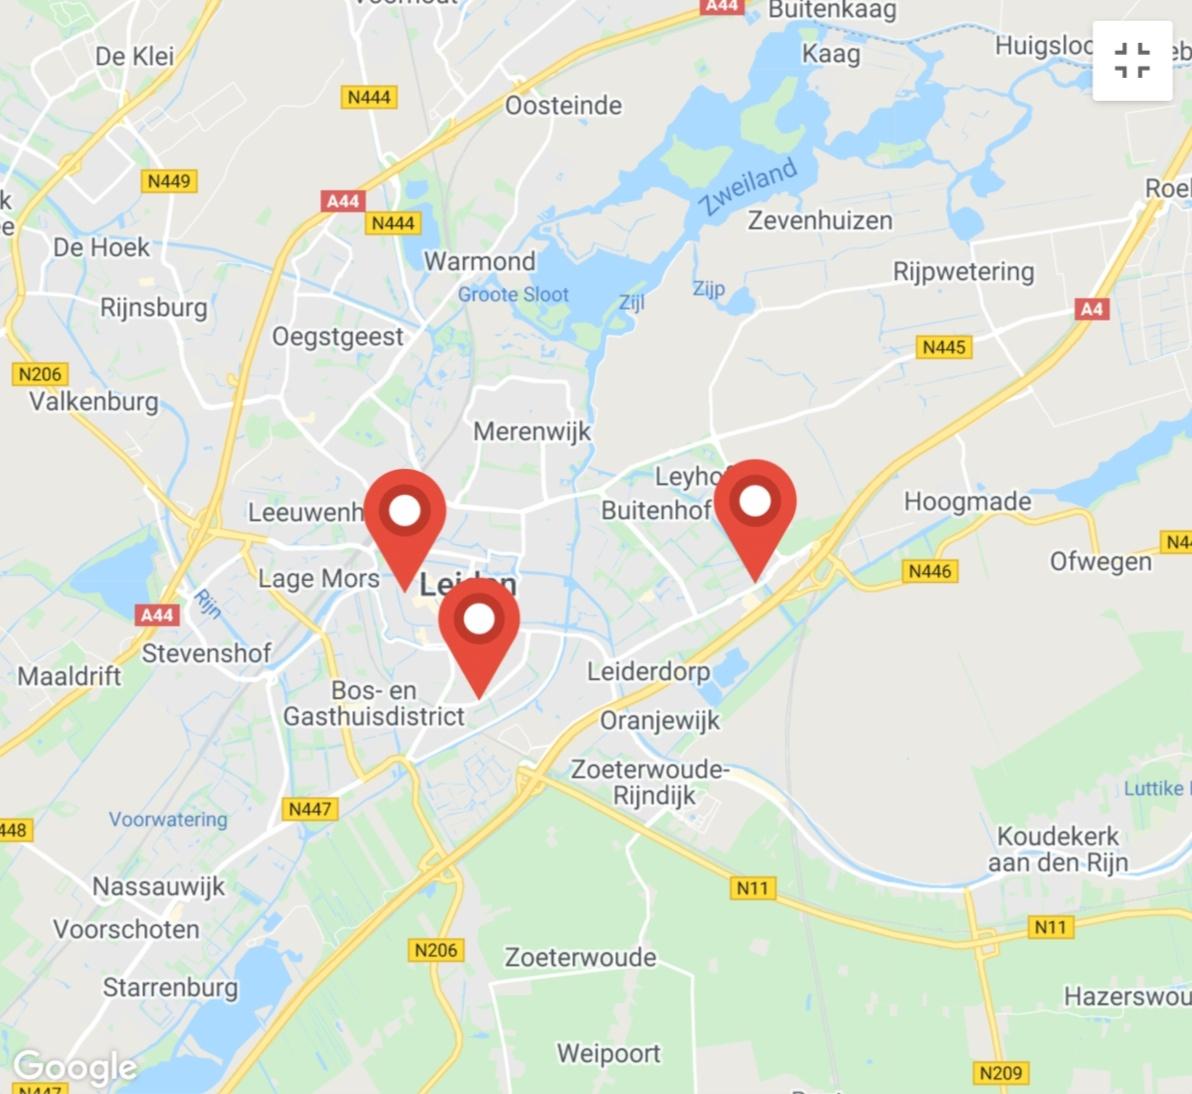 Kaart coronatest-leiderdorp.com - Coronatest locaties Leiden